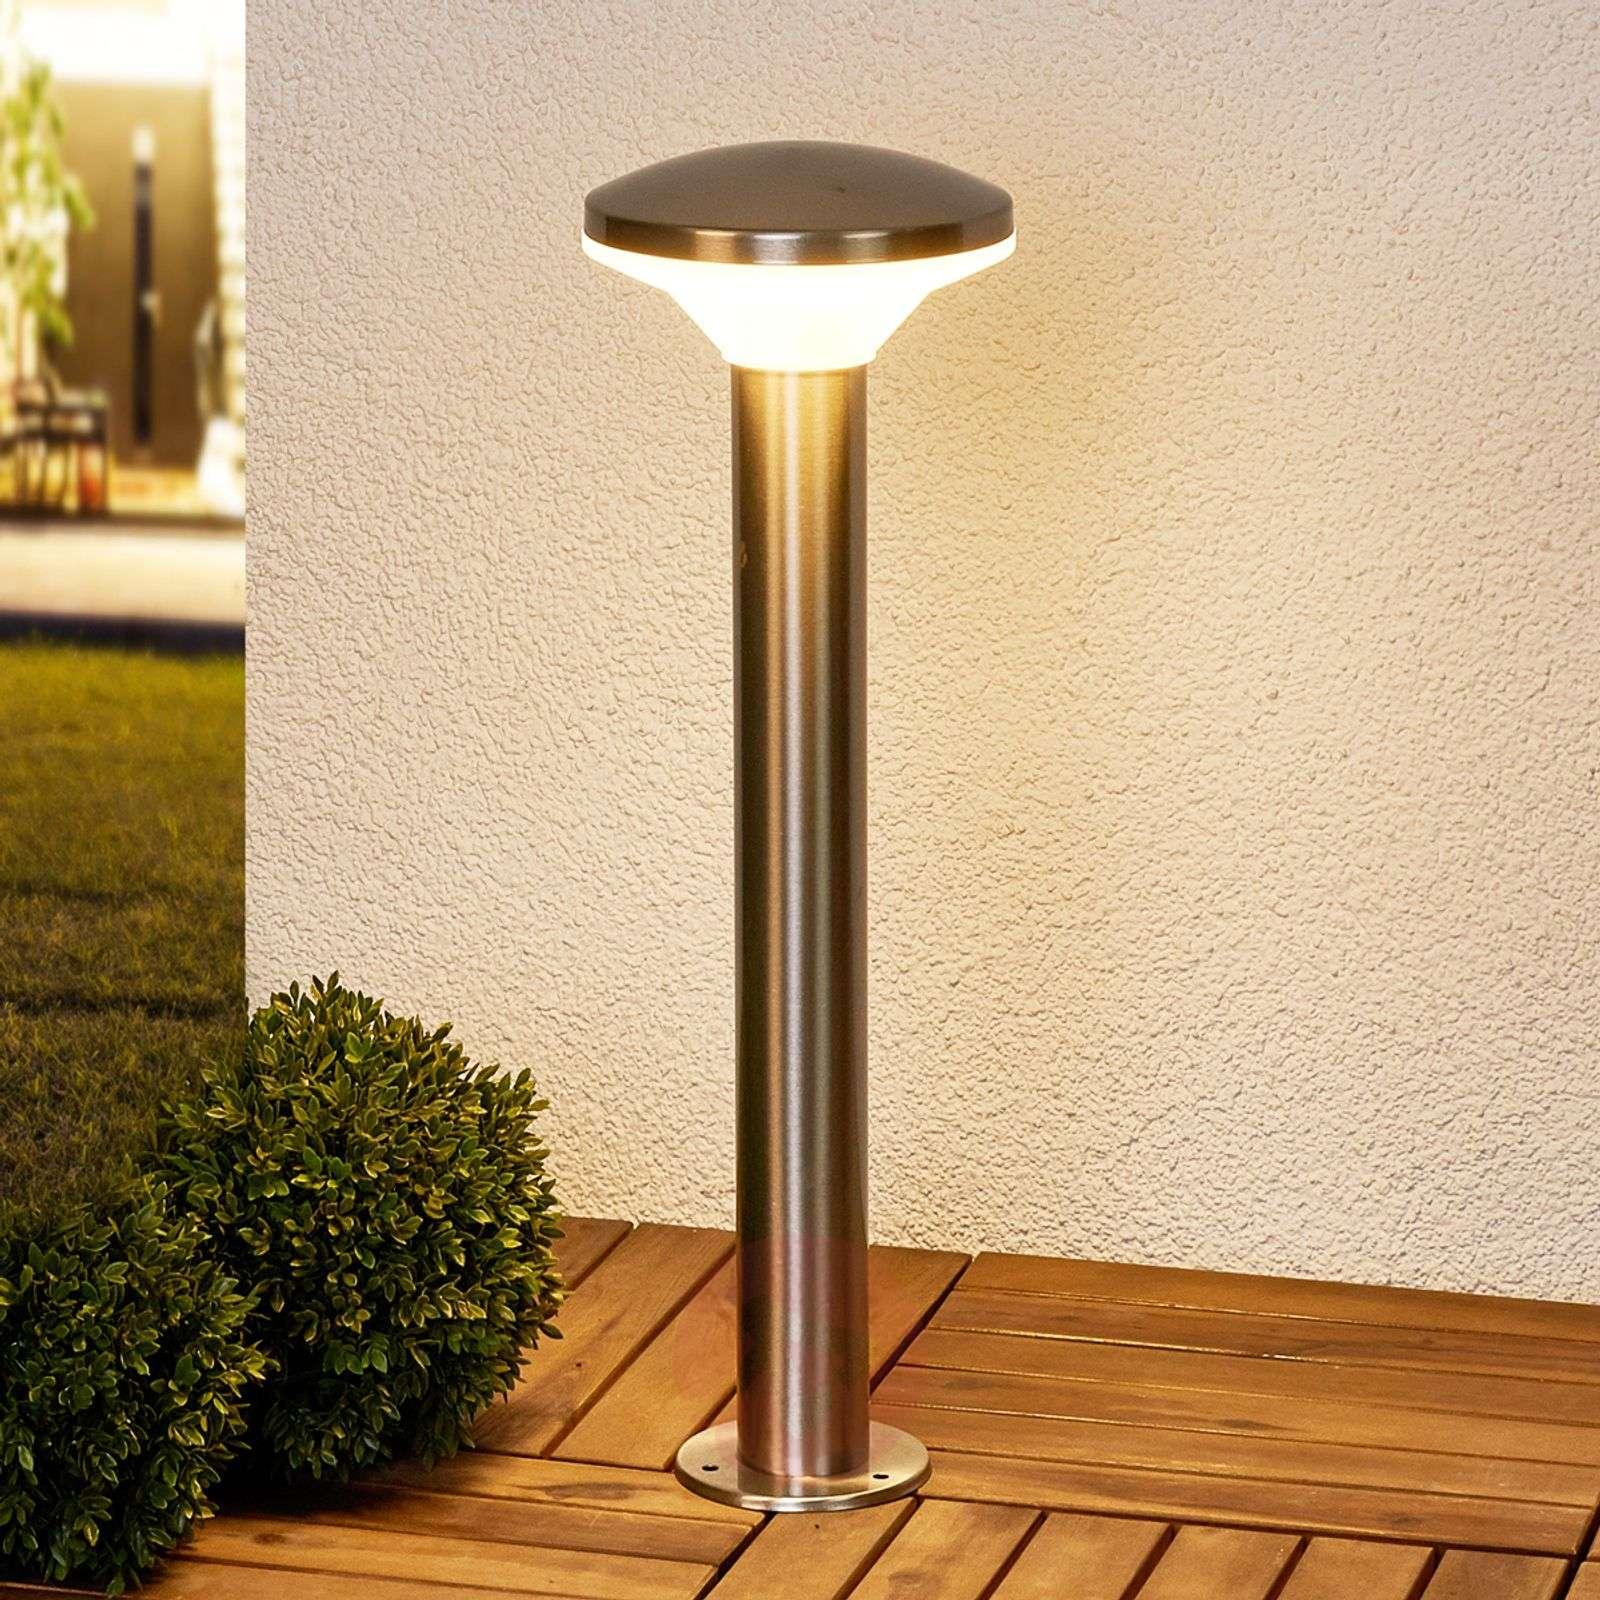 Stainless steel pillar lamp Jiyan with LED-9988079-02